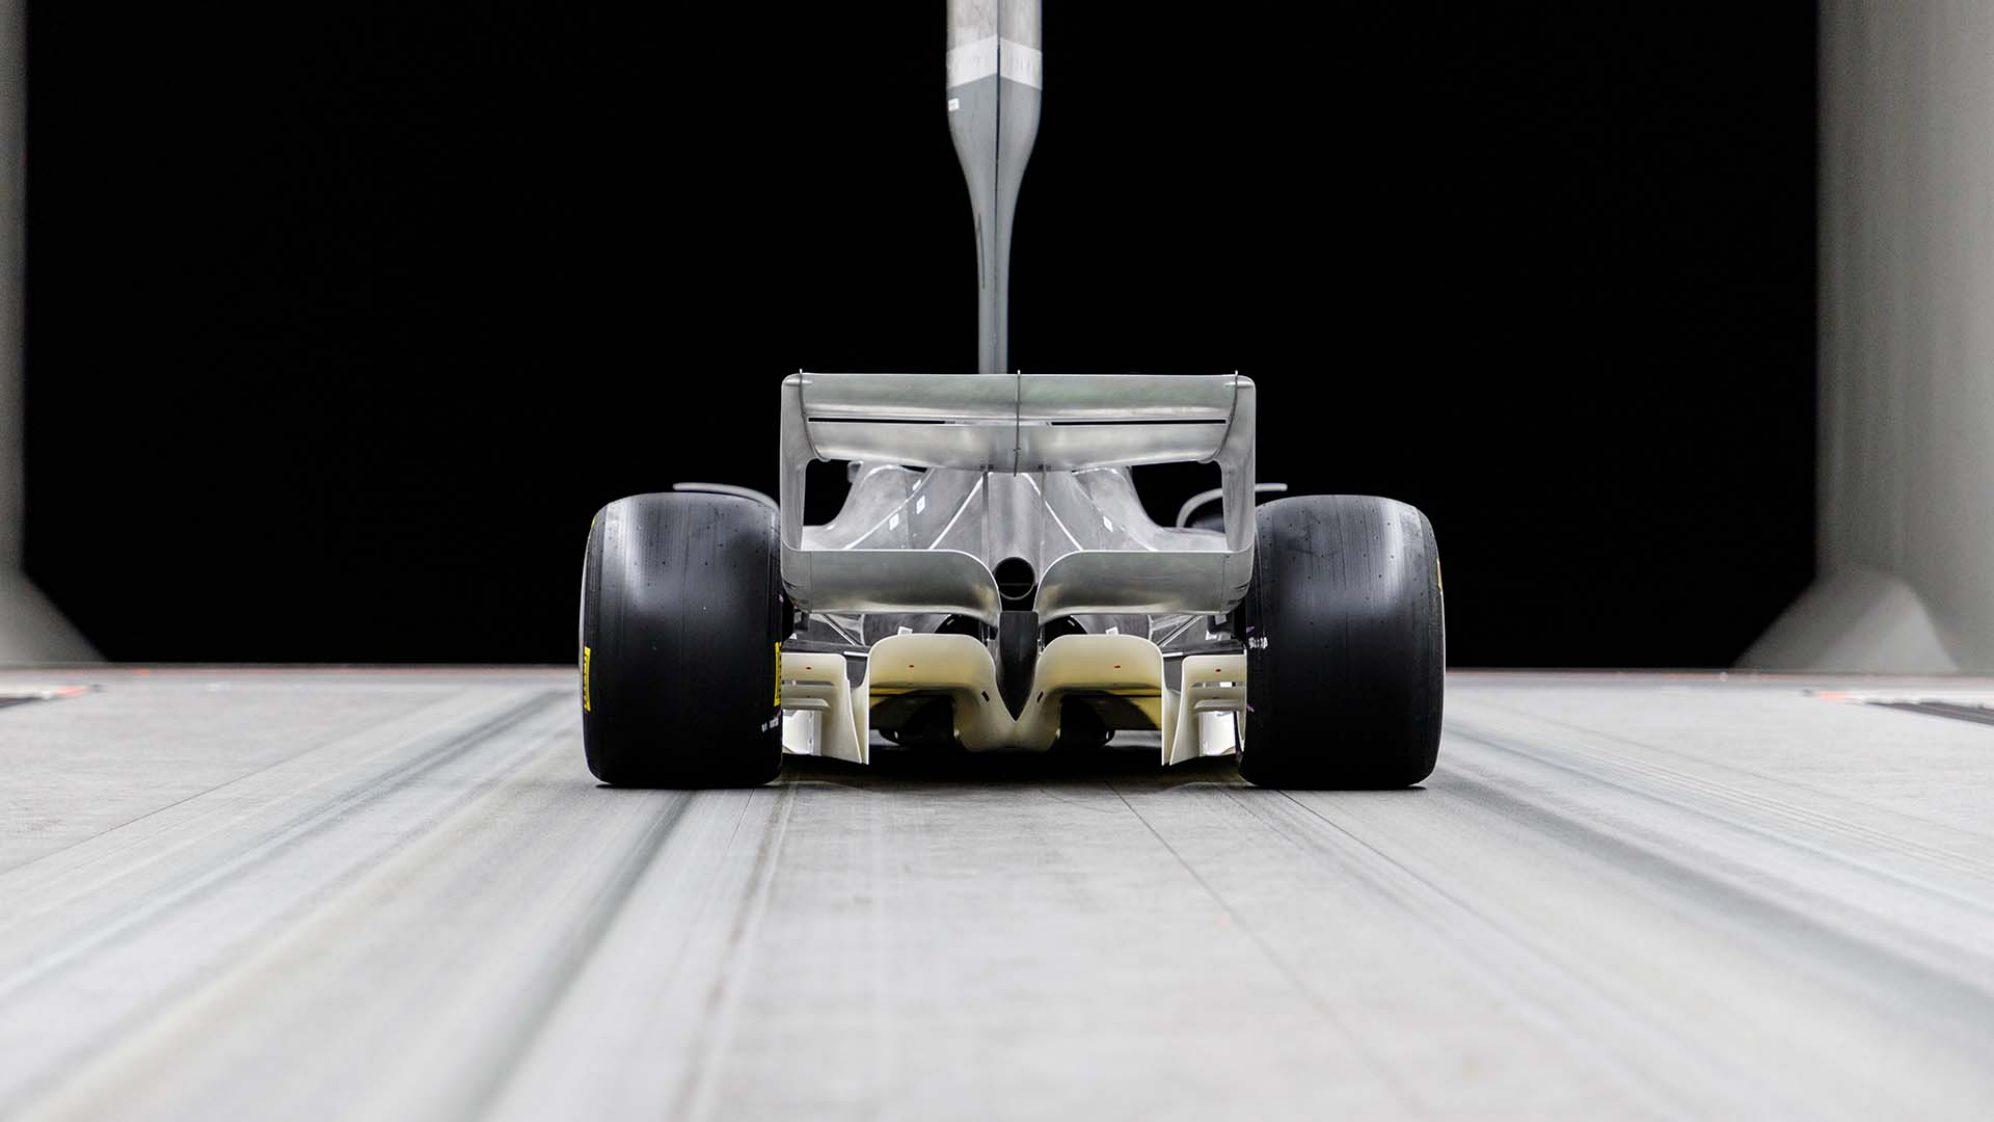 2021 F1 Car Model in wind tunnel